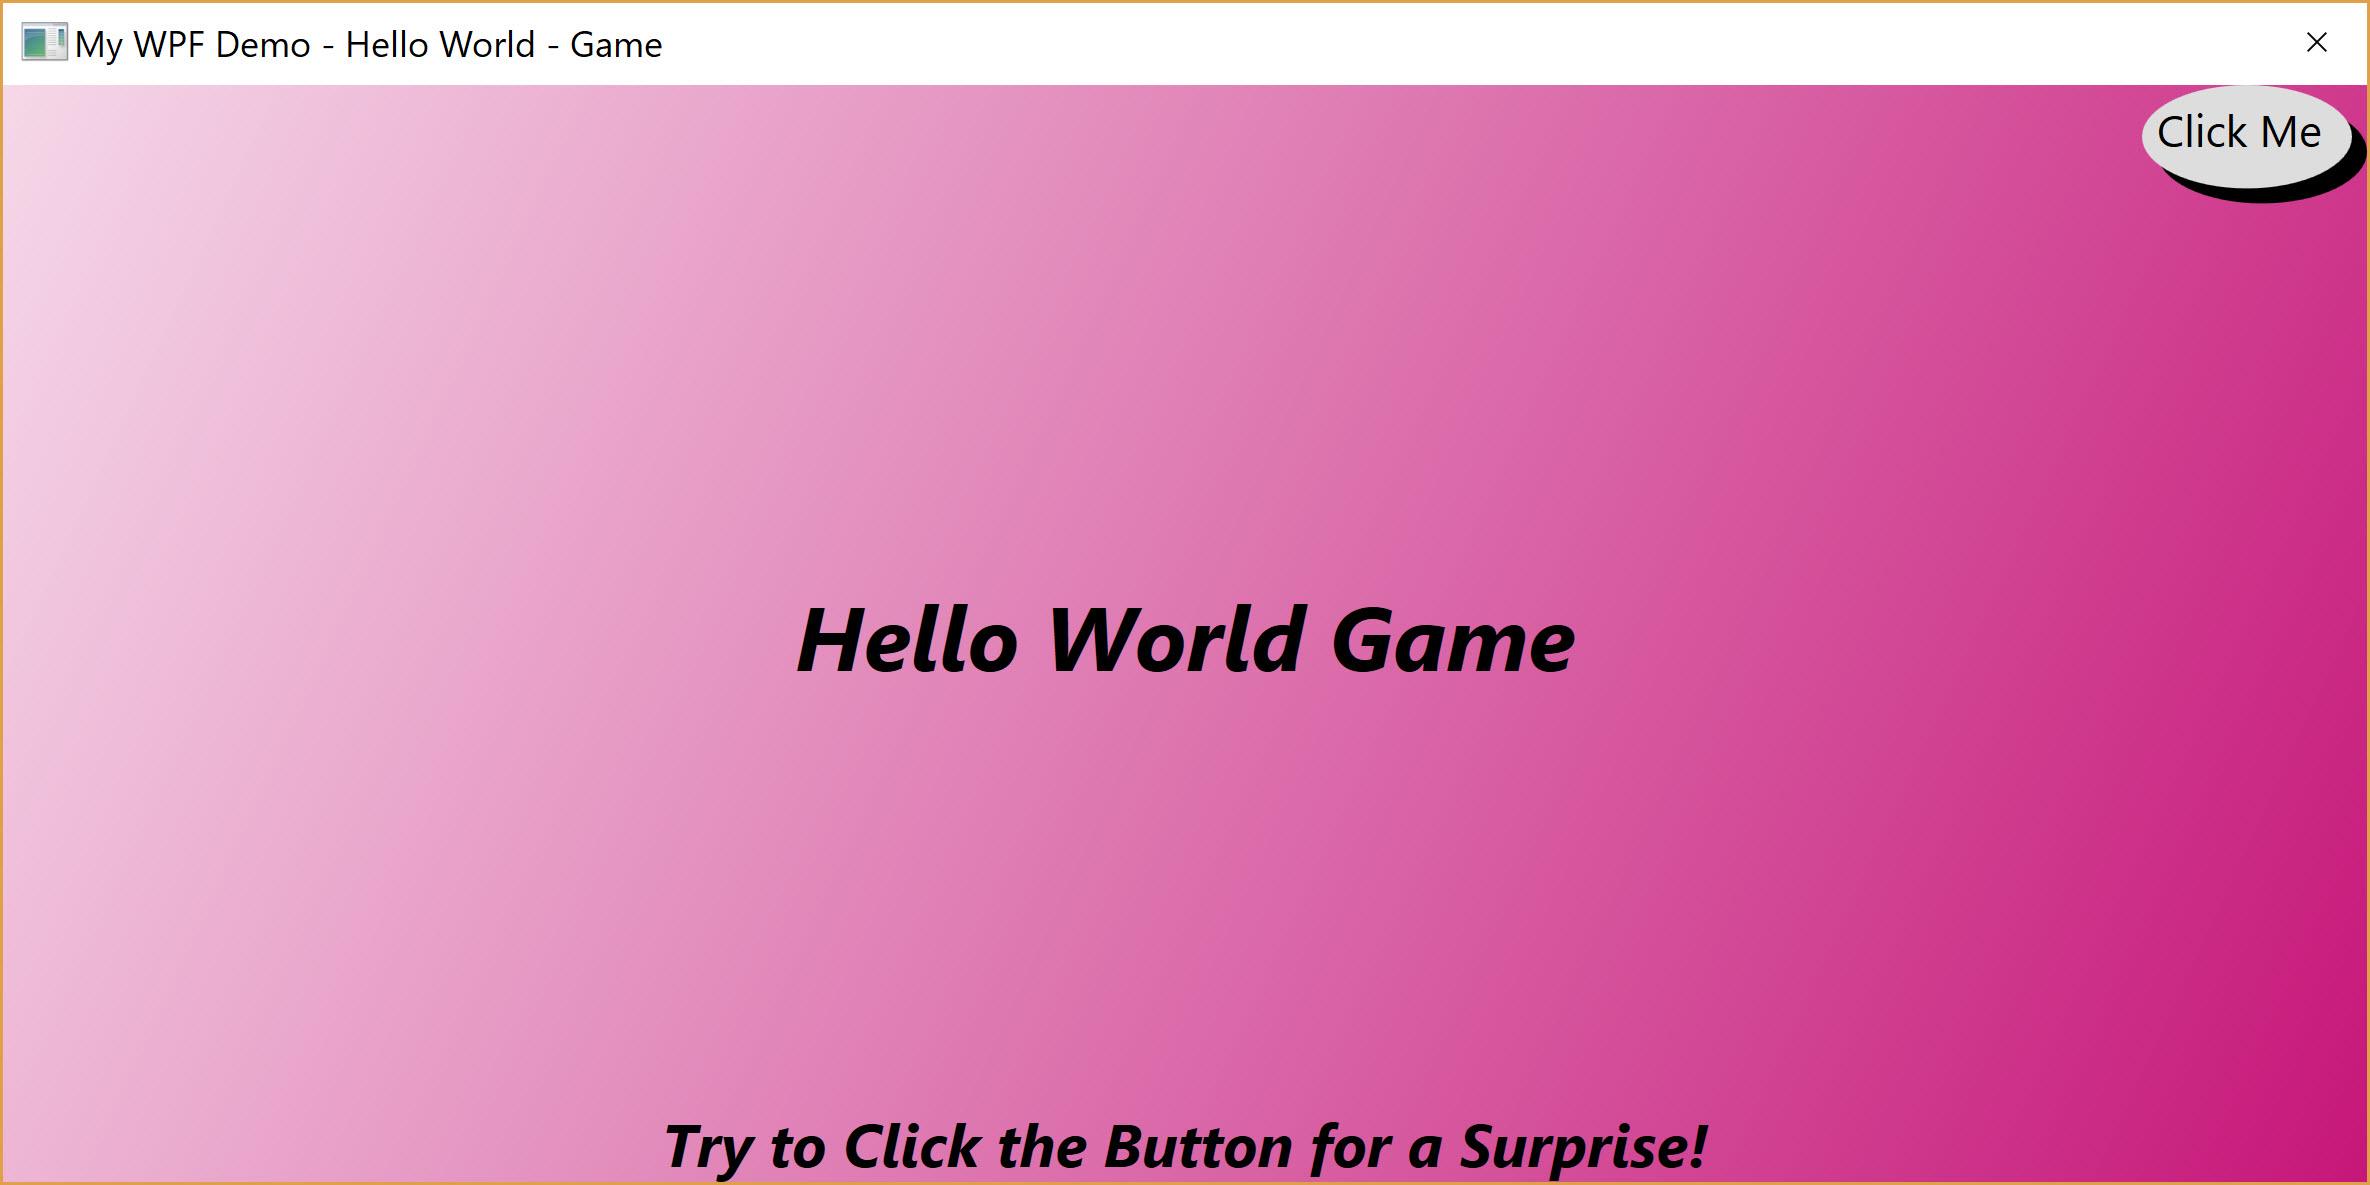 Hello World Game Main Display